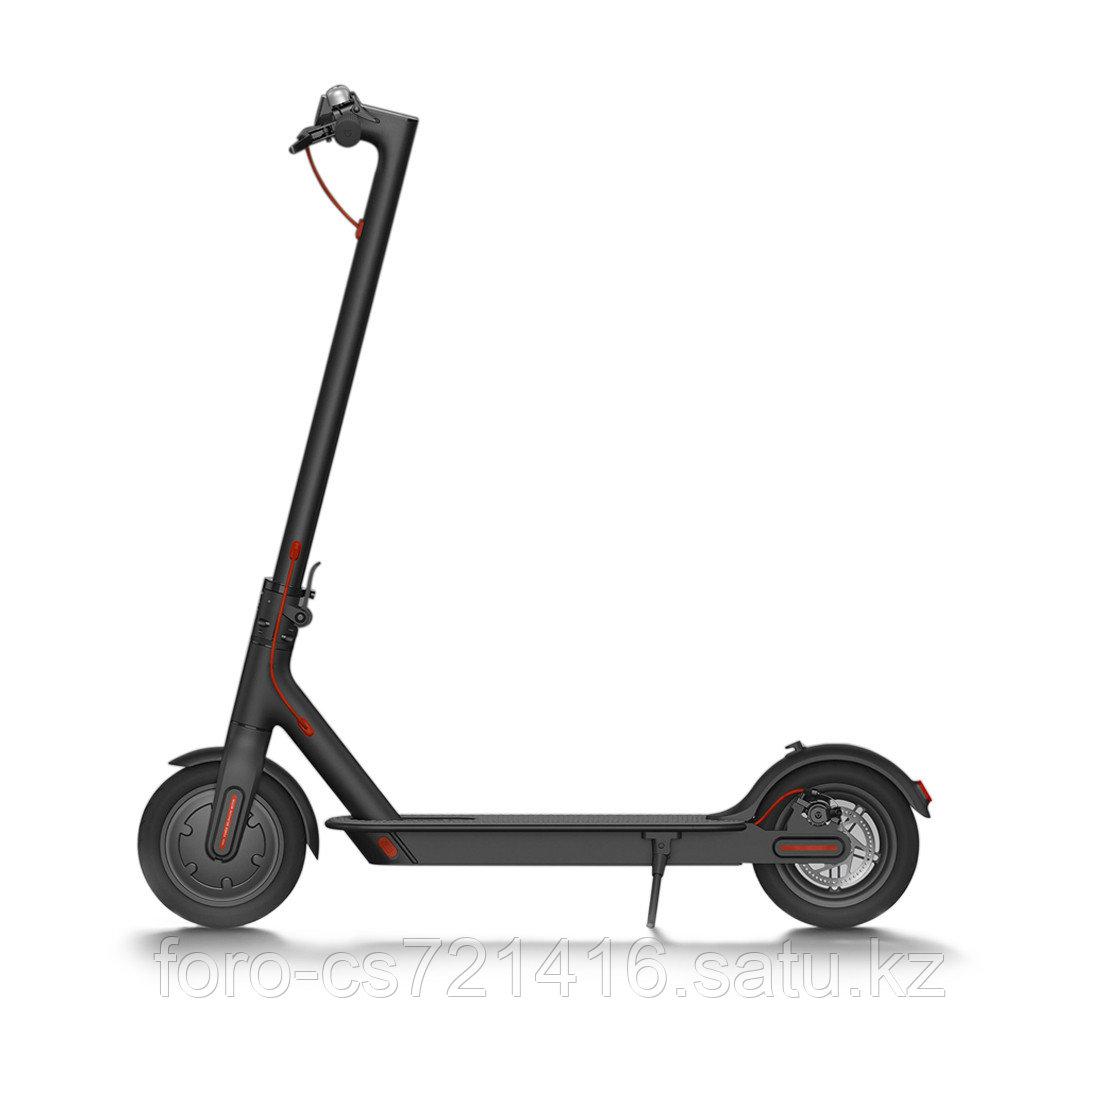 Электросамокат Xiaomi MiJia Smart Electric Scooter (M365) Чёрный - фото 1